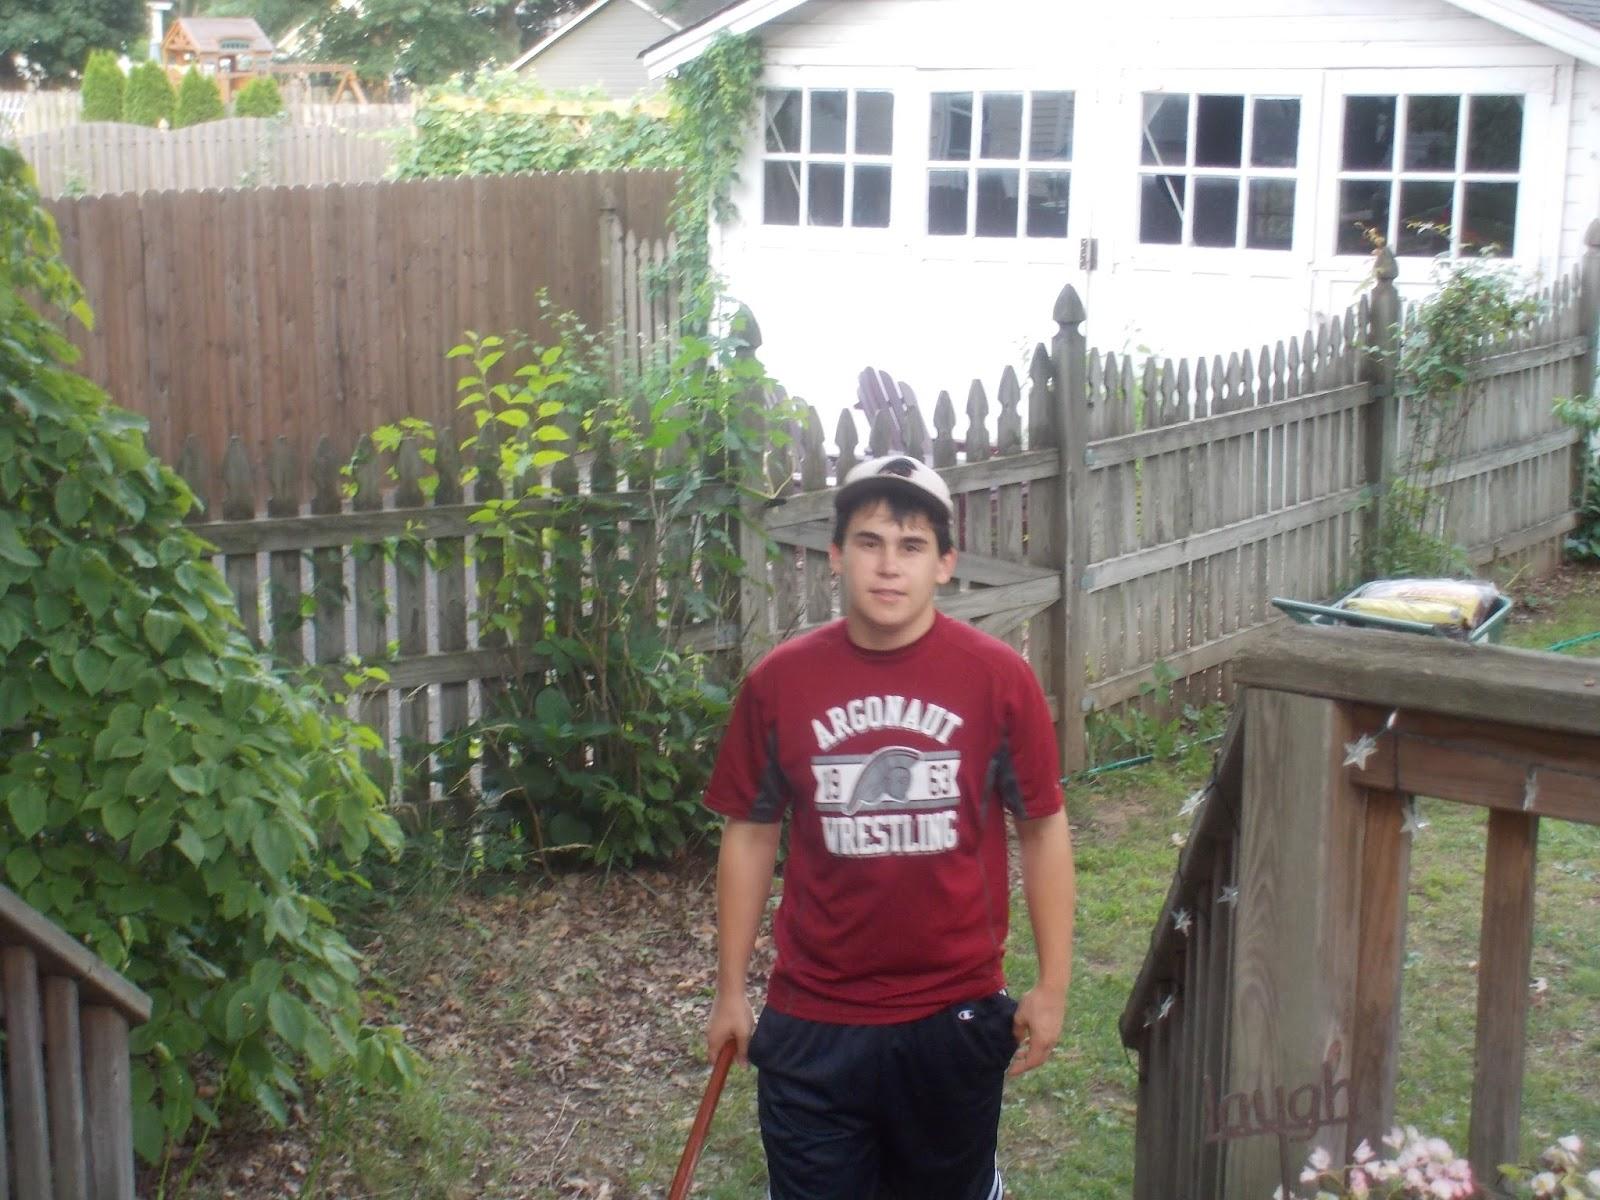 sassafras mama on backyards and little boys